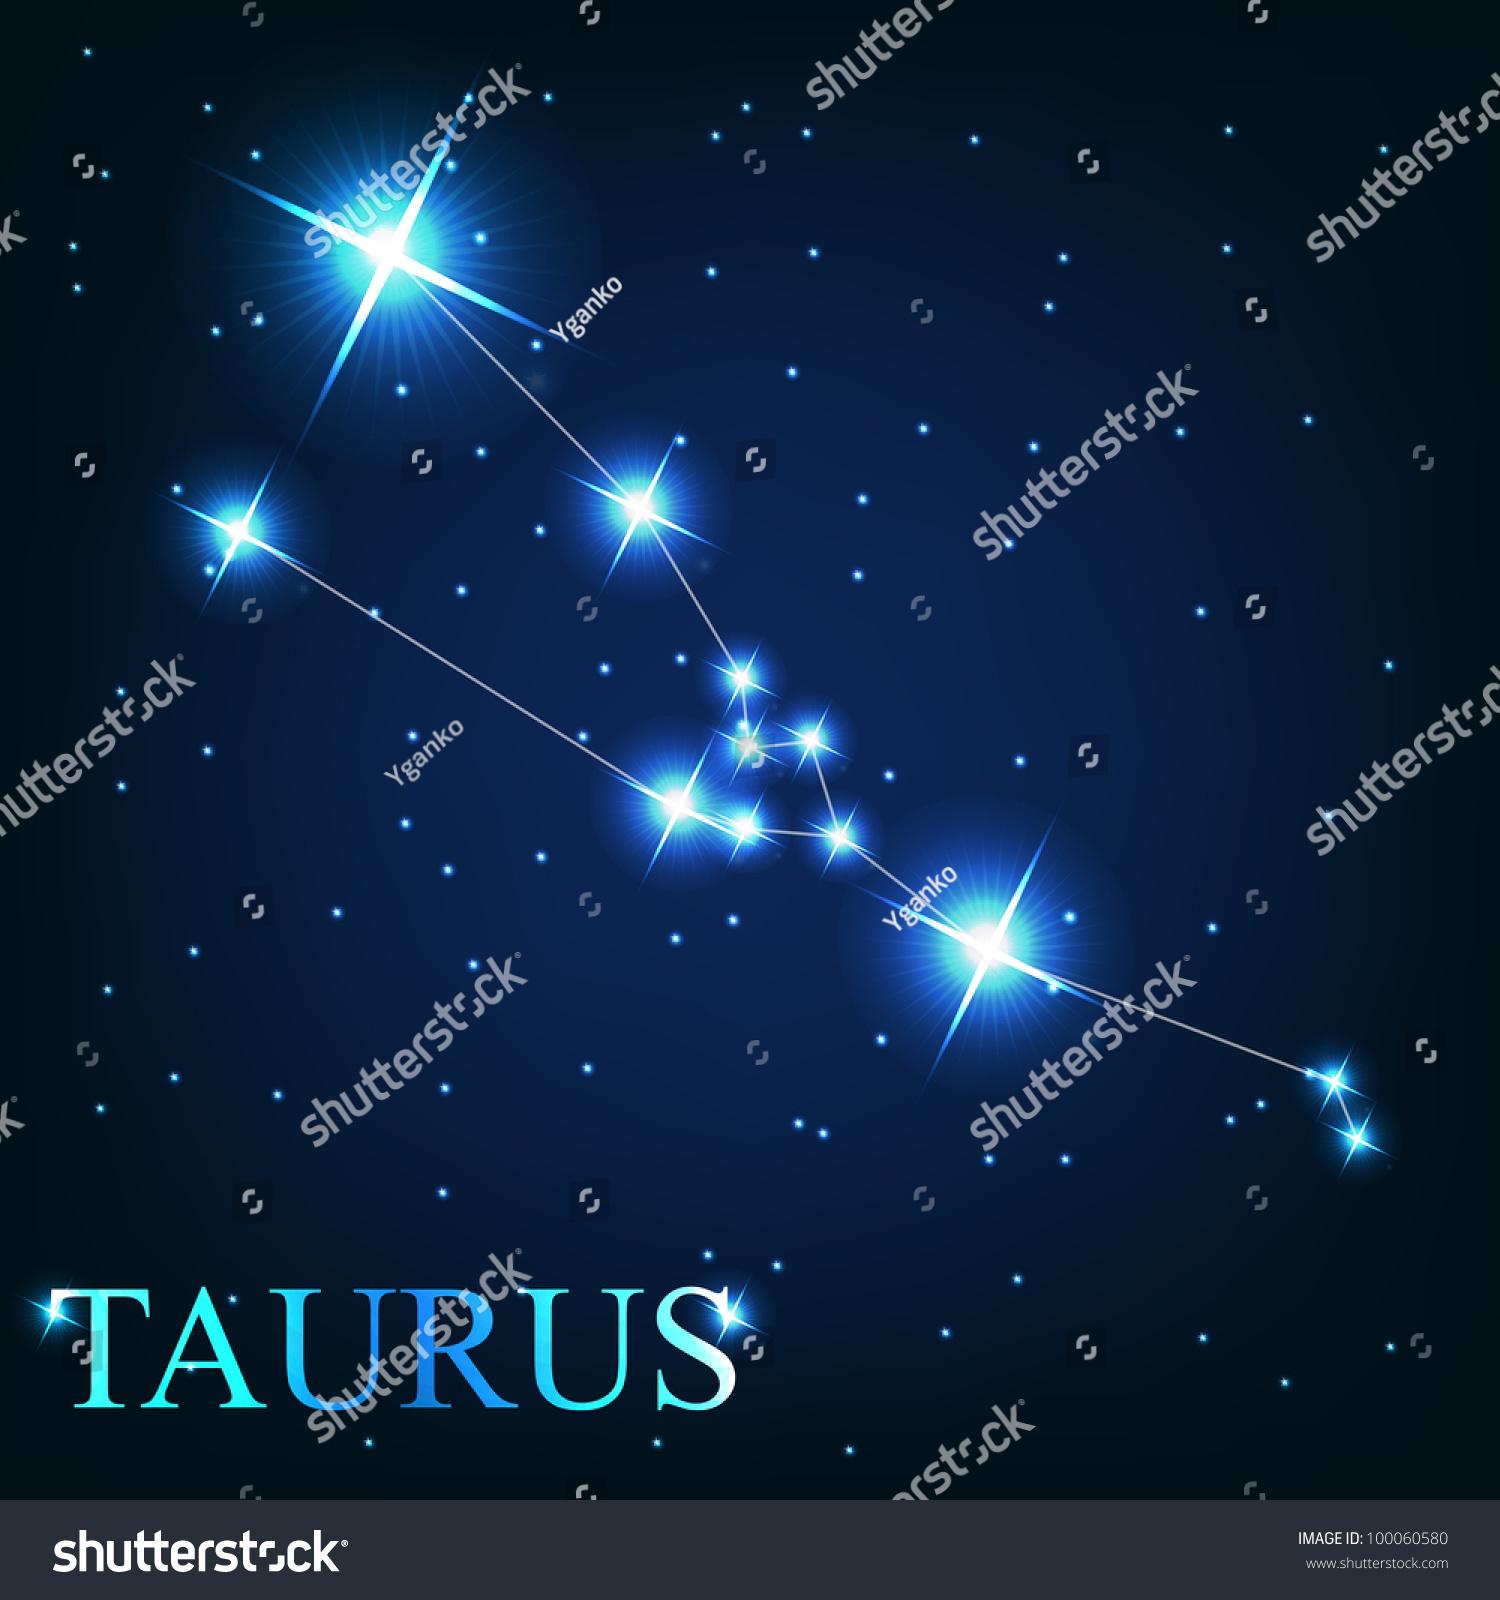 Zodiac Sign Taurus Stock Photo Taurus Zodiac Sign Of The Beautiful